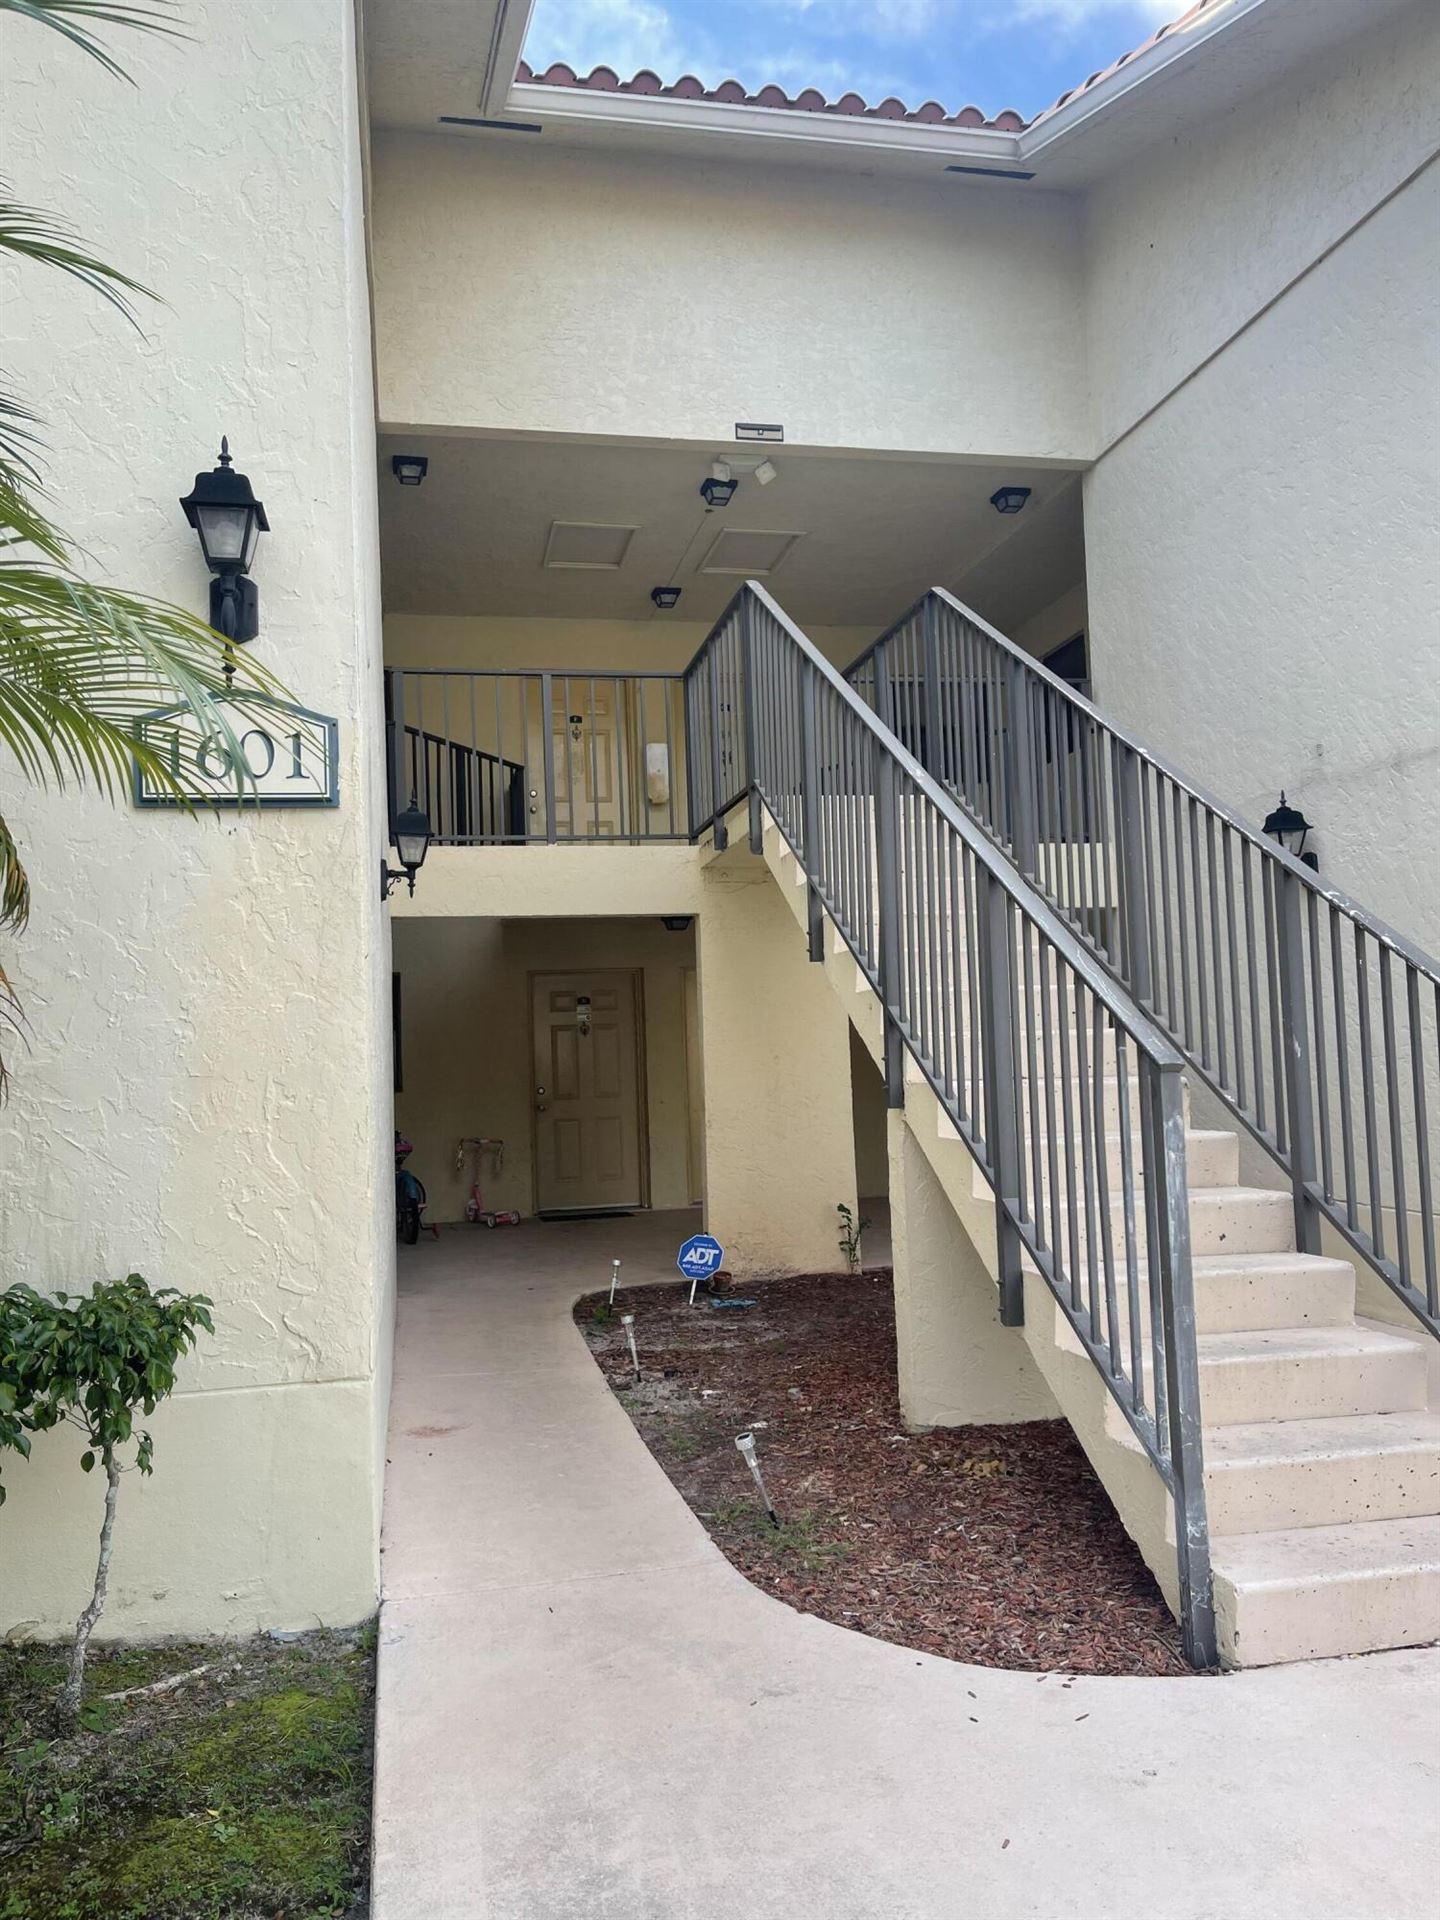 1601 Balfour Point #B, West Palm Beach, FL 33411 - MLS#: RX-10751018